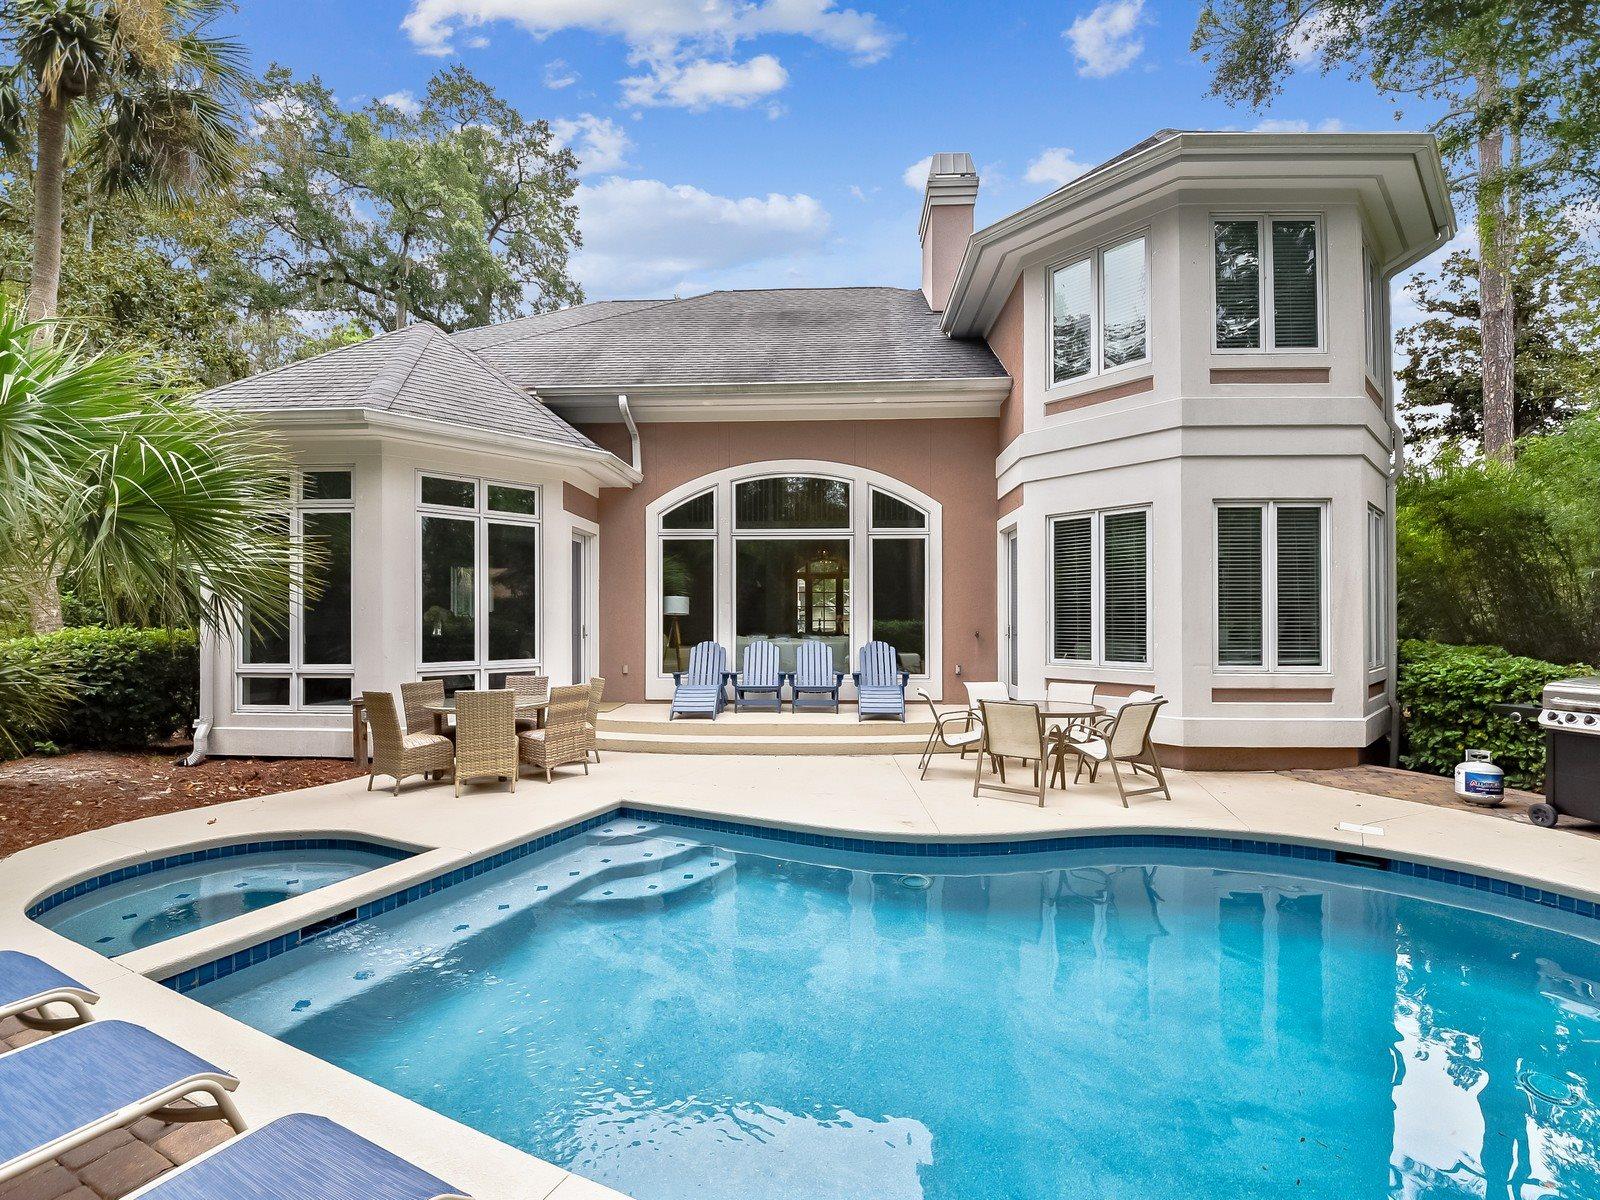 Hilton Head Island Vacation Rental Homes Villas Beach Properties Of Hilton Head